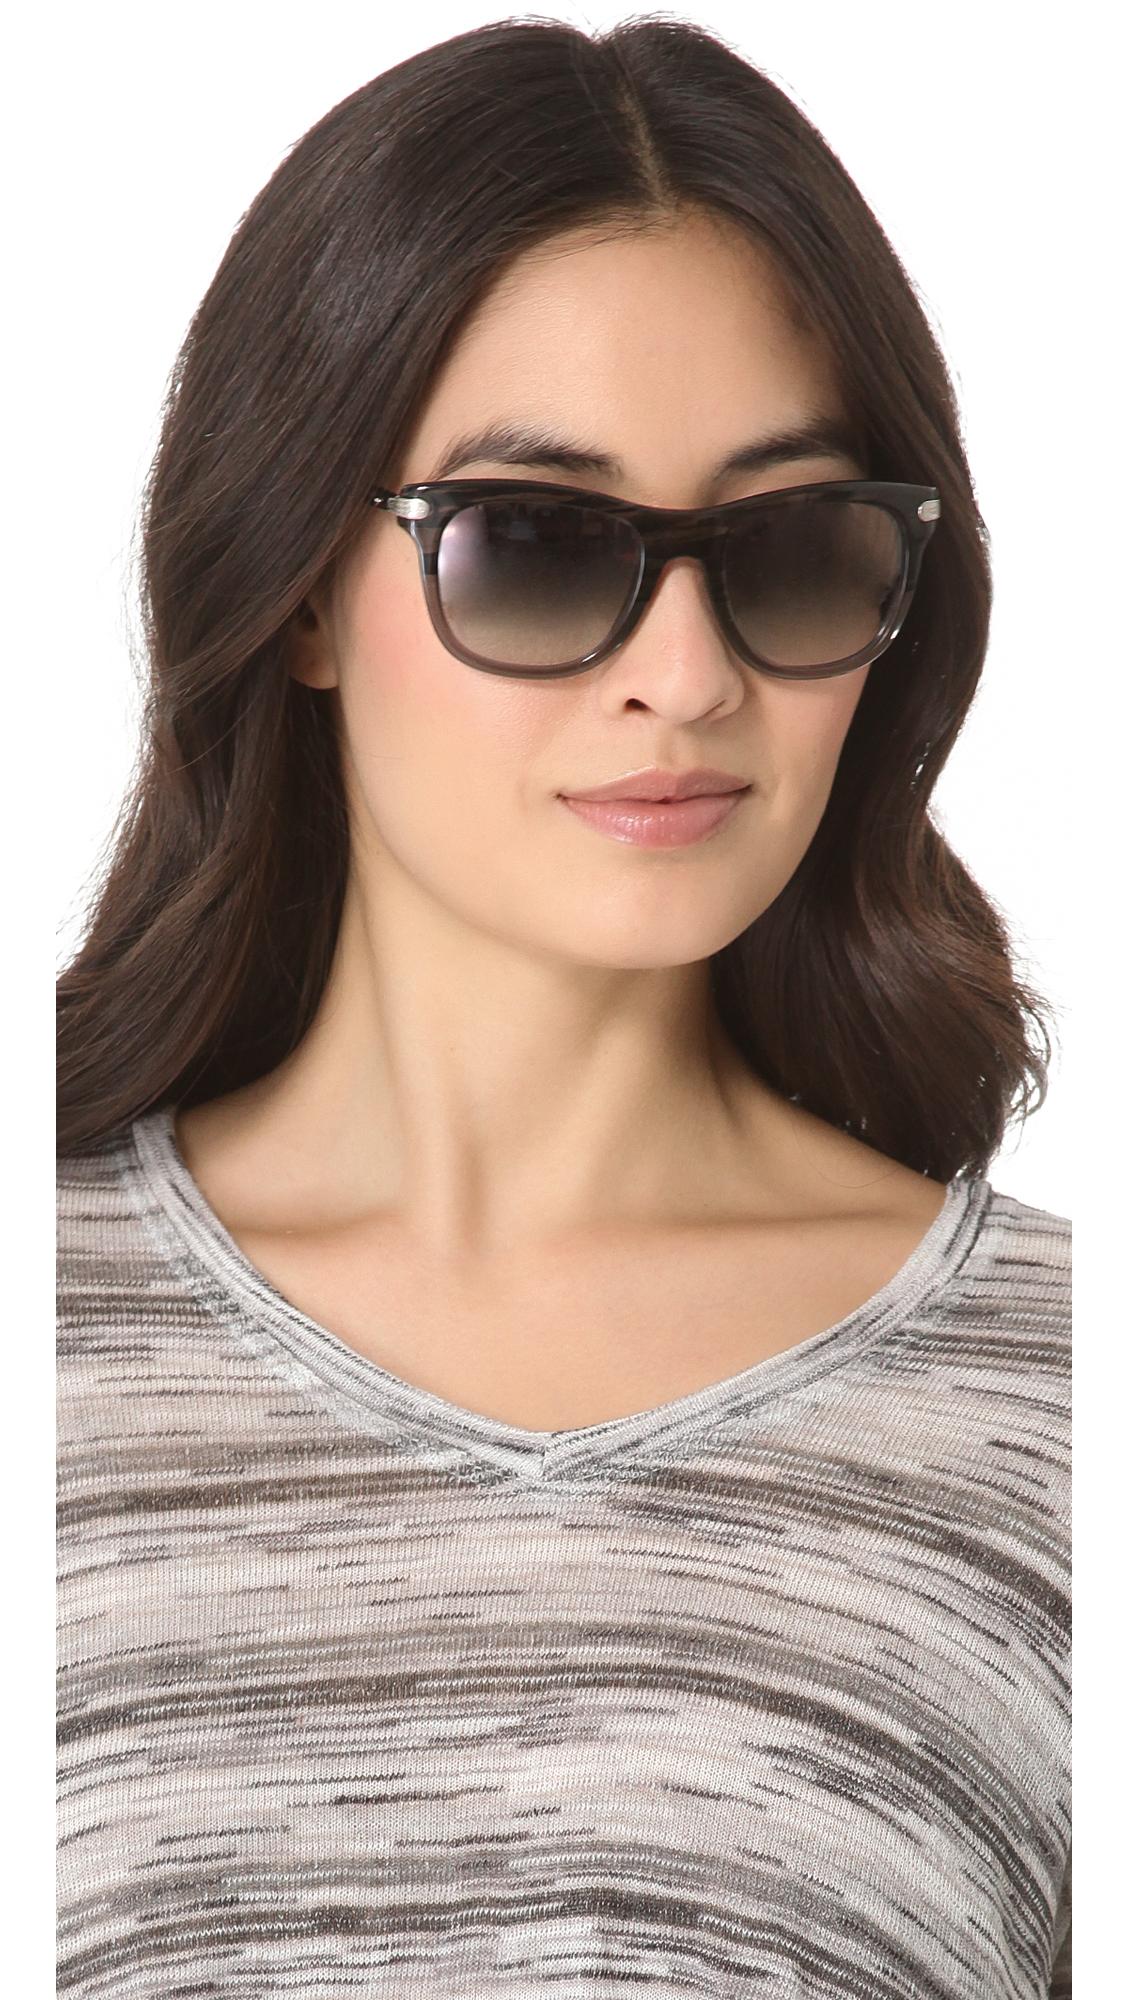 Xxv Oliver SunglassesShopbop Eyewear Photochromic Peoples UqVpzSM